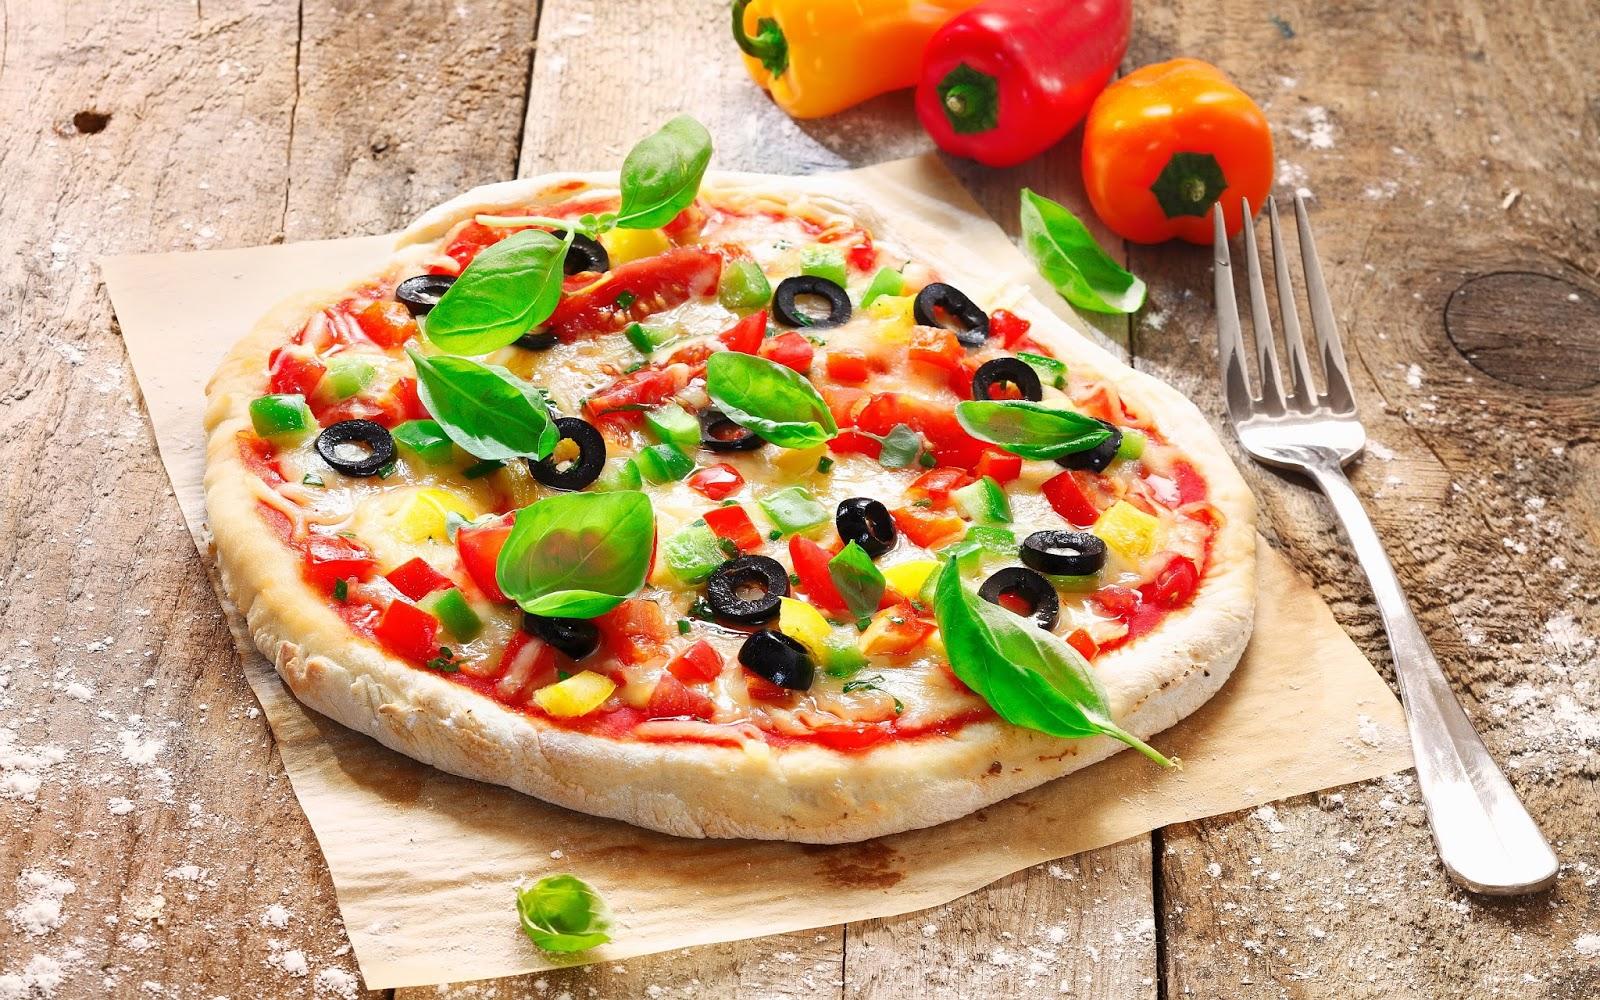 Guglielmo Vallecoccia Top 5 Must Eat Famous Italian Food